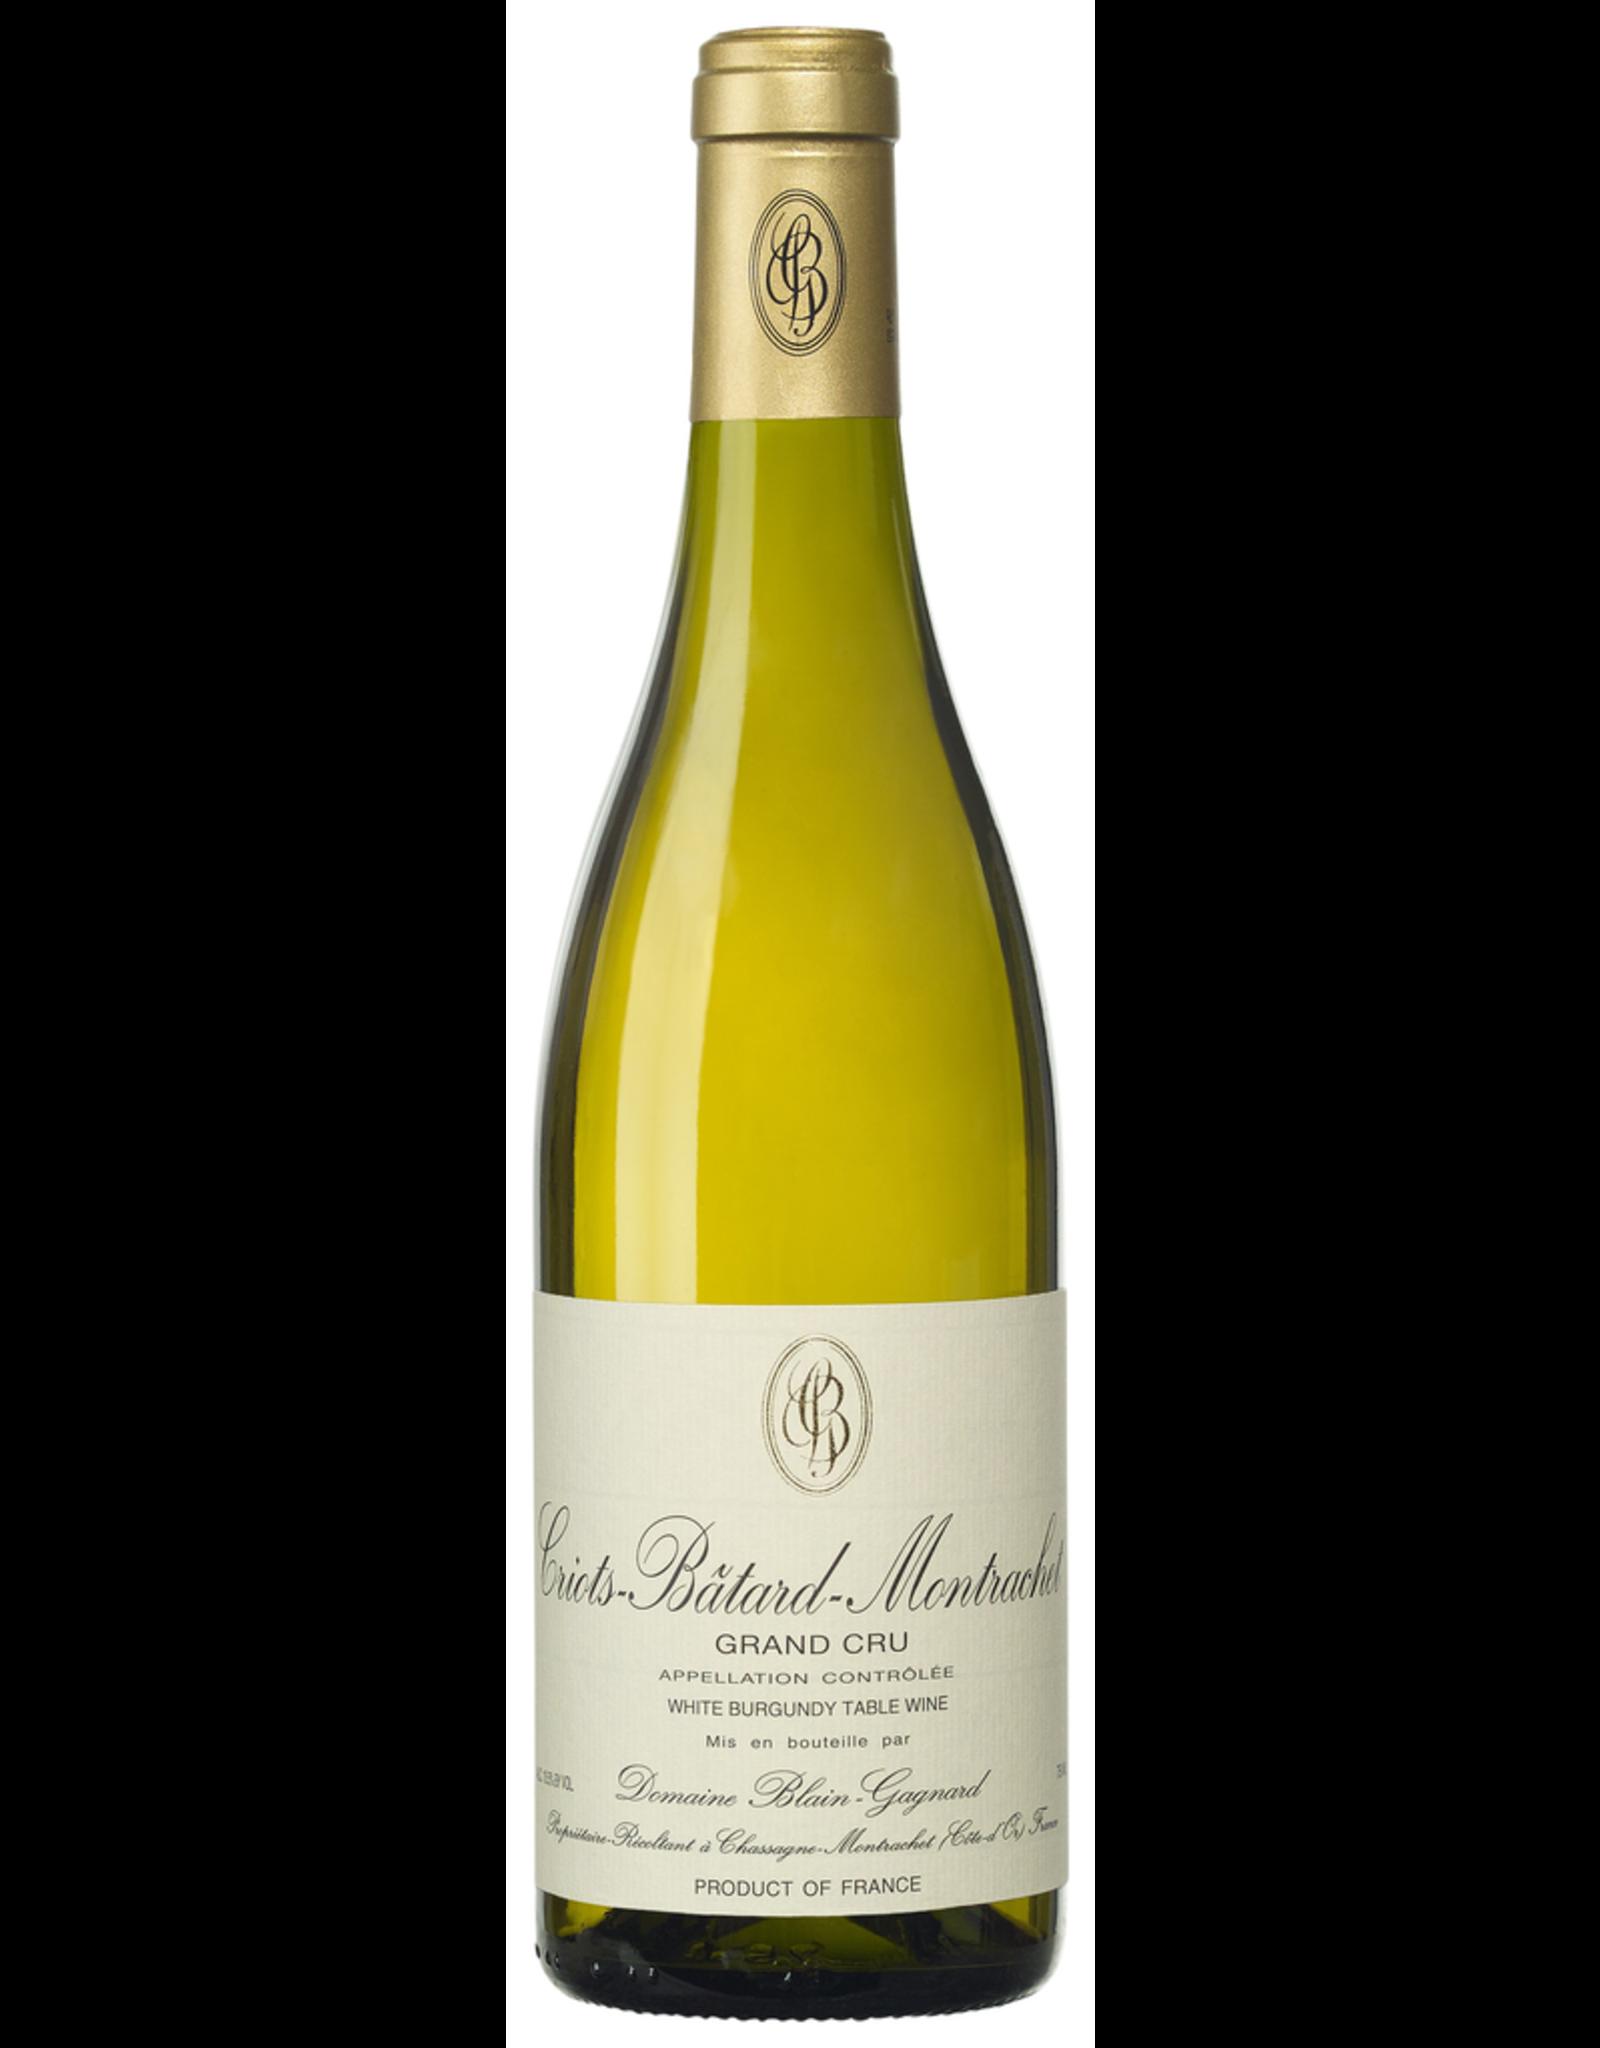 White Wine 2018, Domaine Blain-Gagnard  Griots-Batard-Montrachet Grand Cru, Chardonnay, Criots-Batard-Montrachet, Burgundy, France, 13.5% Alc, CTnr